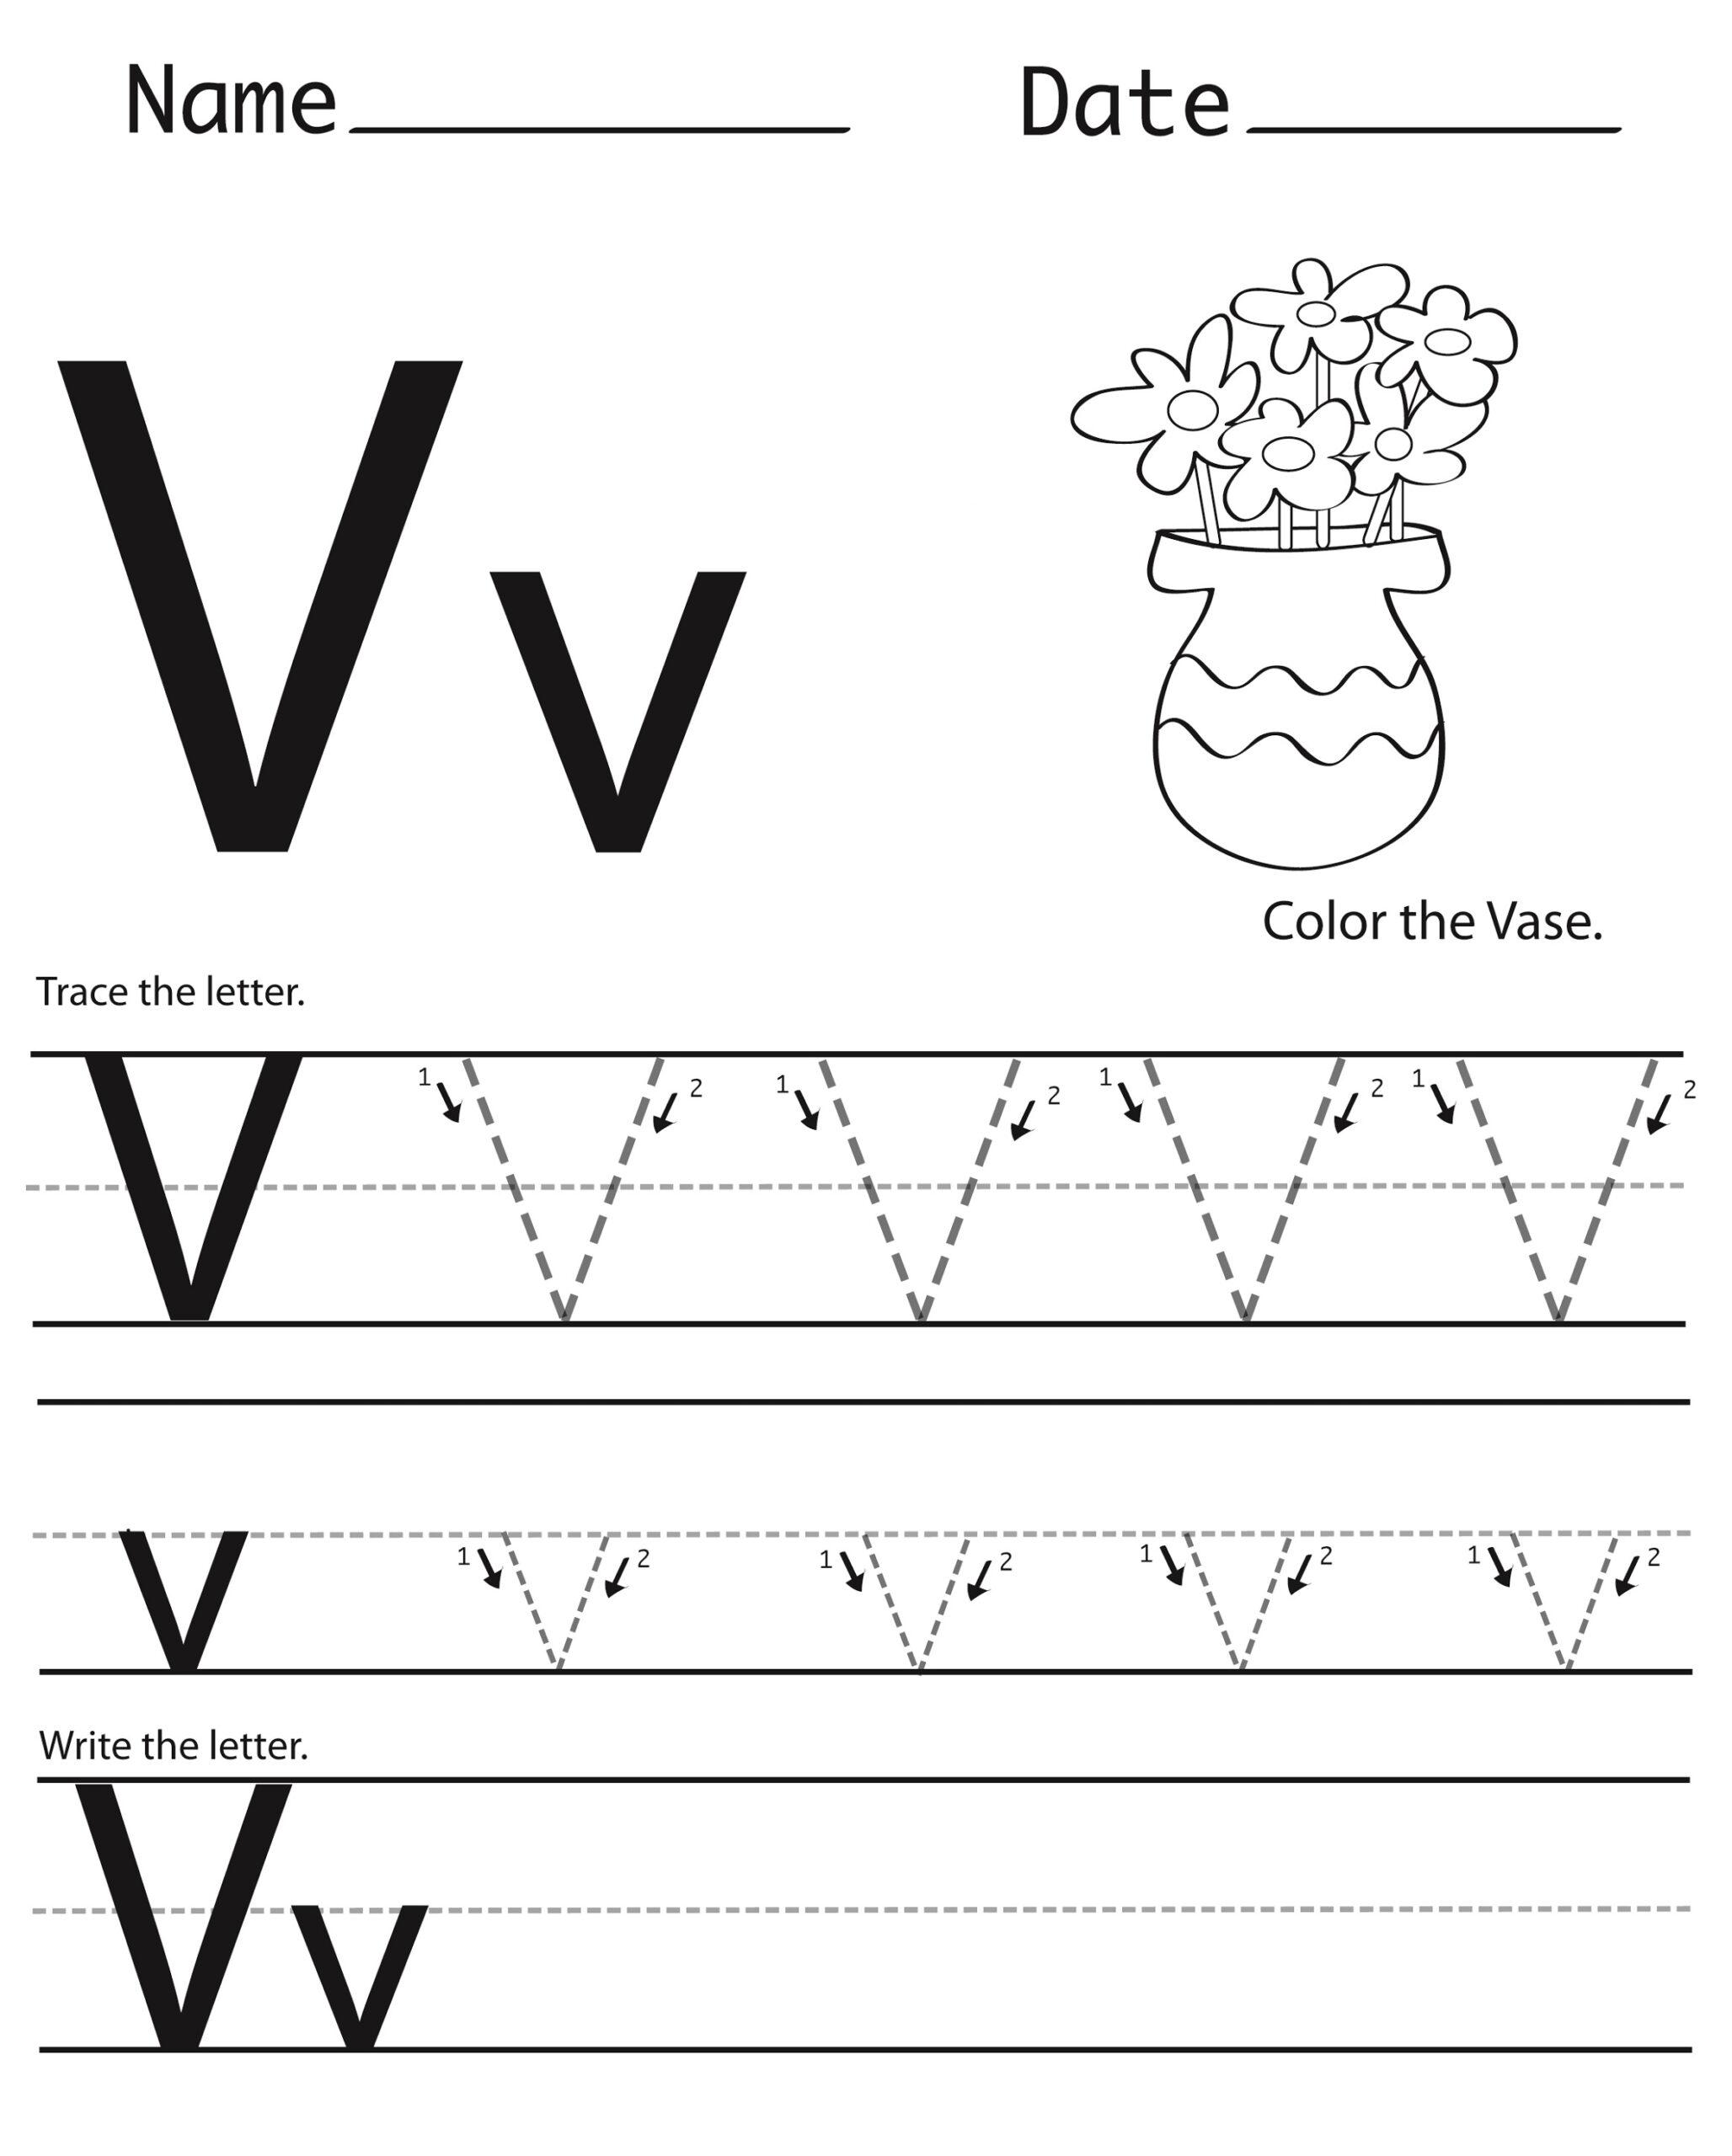 Letter V Worksheets To Print   Activity Shelter pertaining to V Letter Worksheets